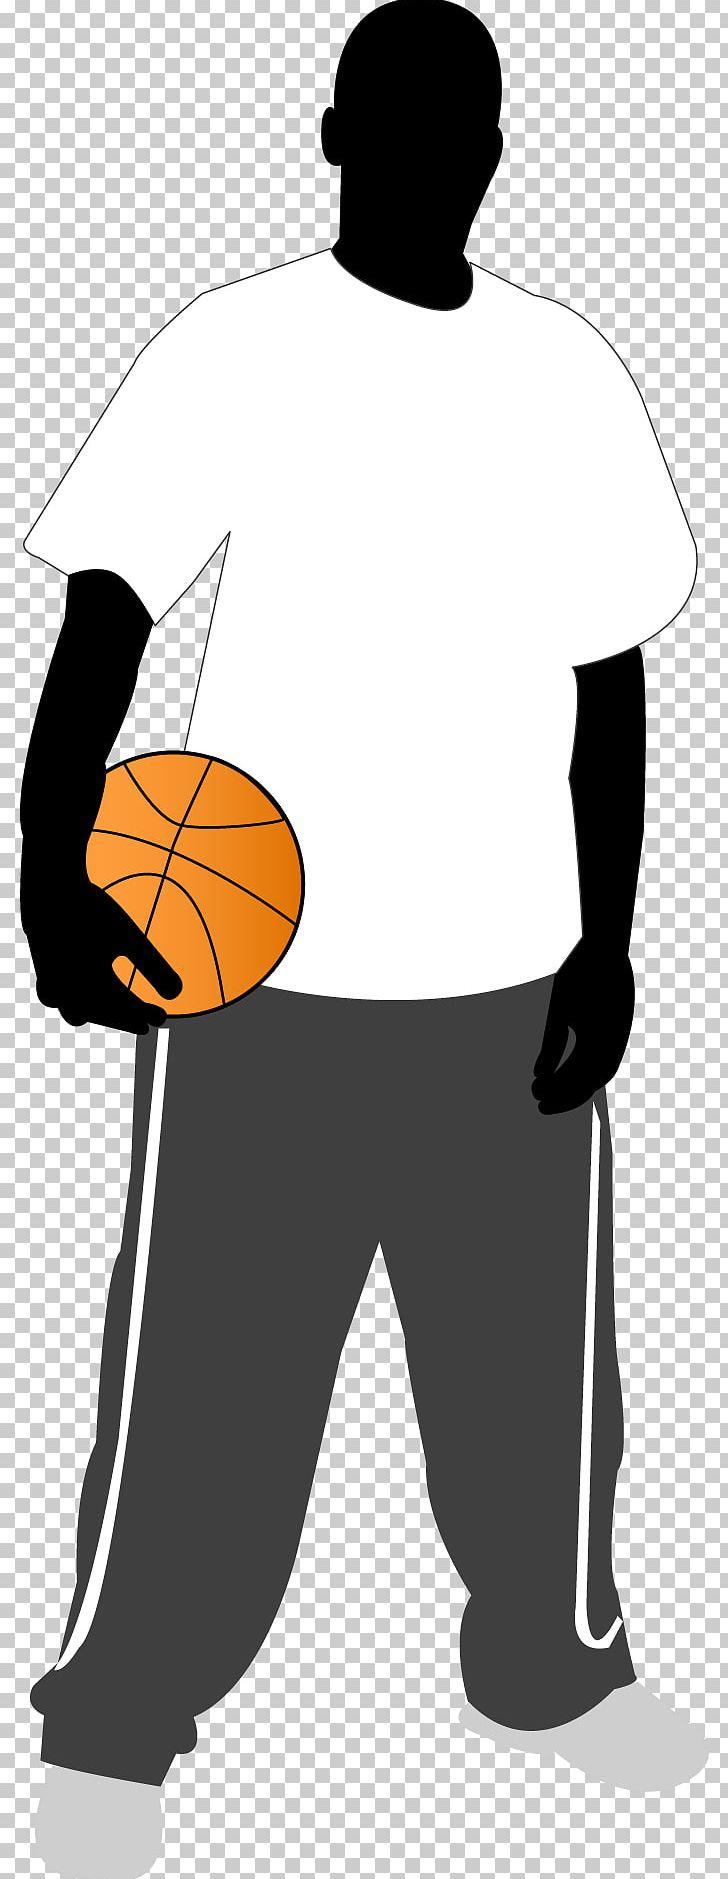 Basketball PNG, Clipart, Angry Man, Athletes, Ball, Basketball, Basketball Player Free PNG Download